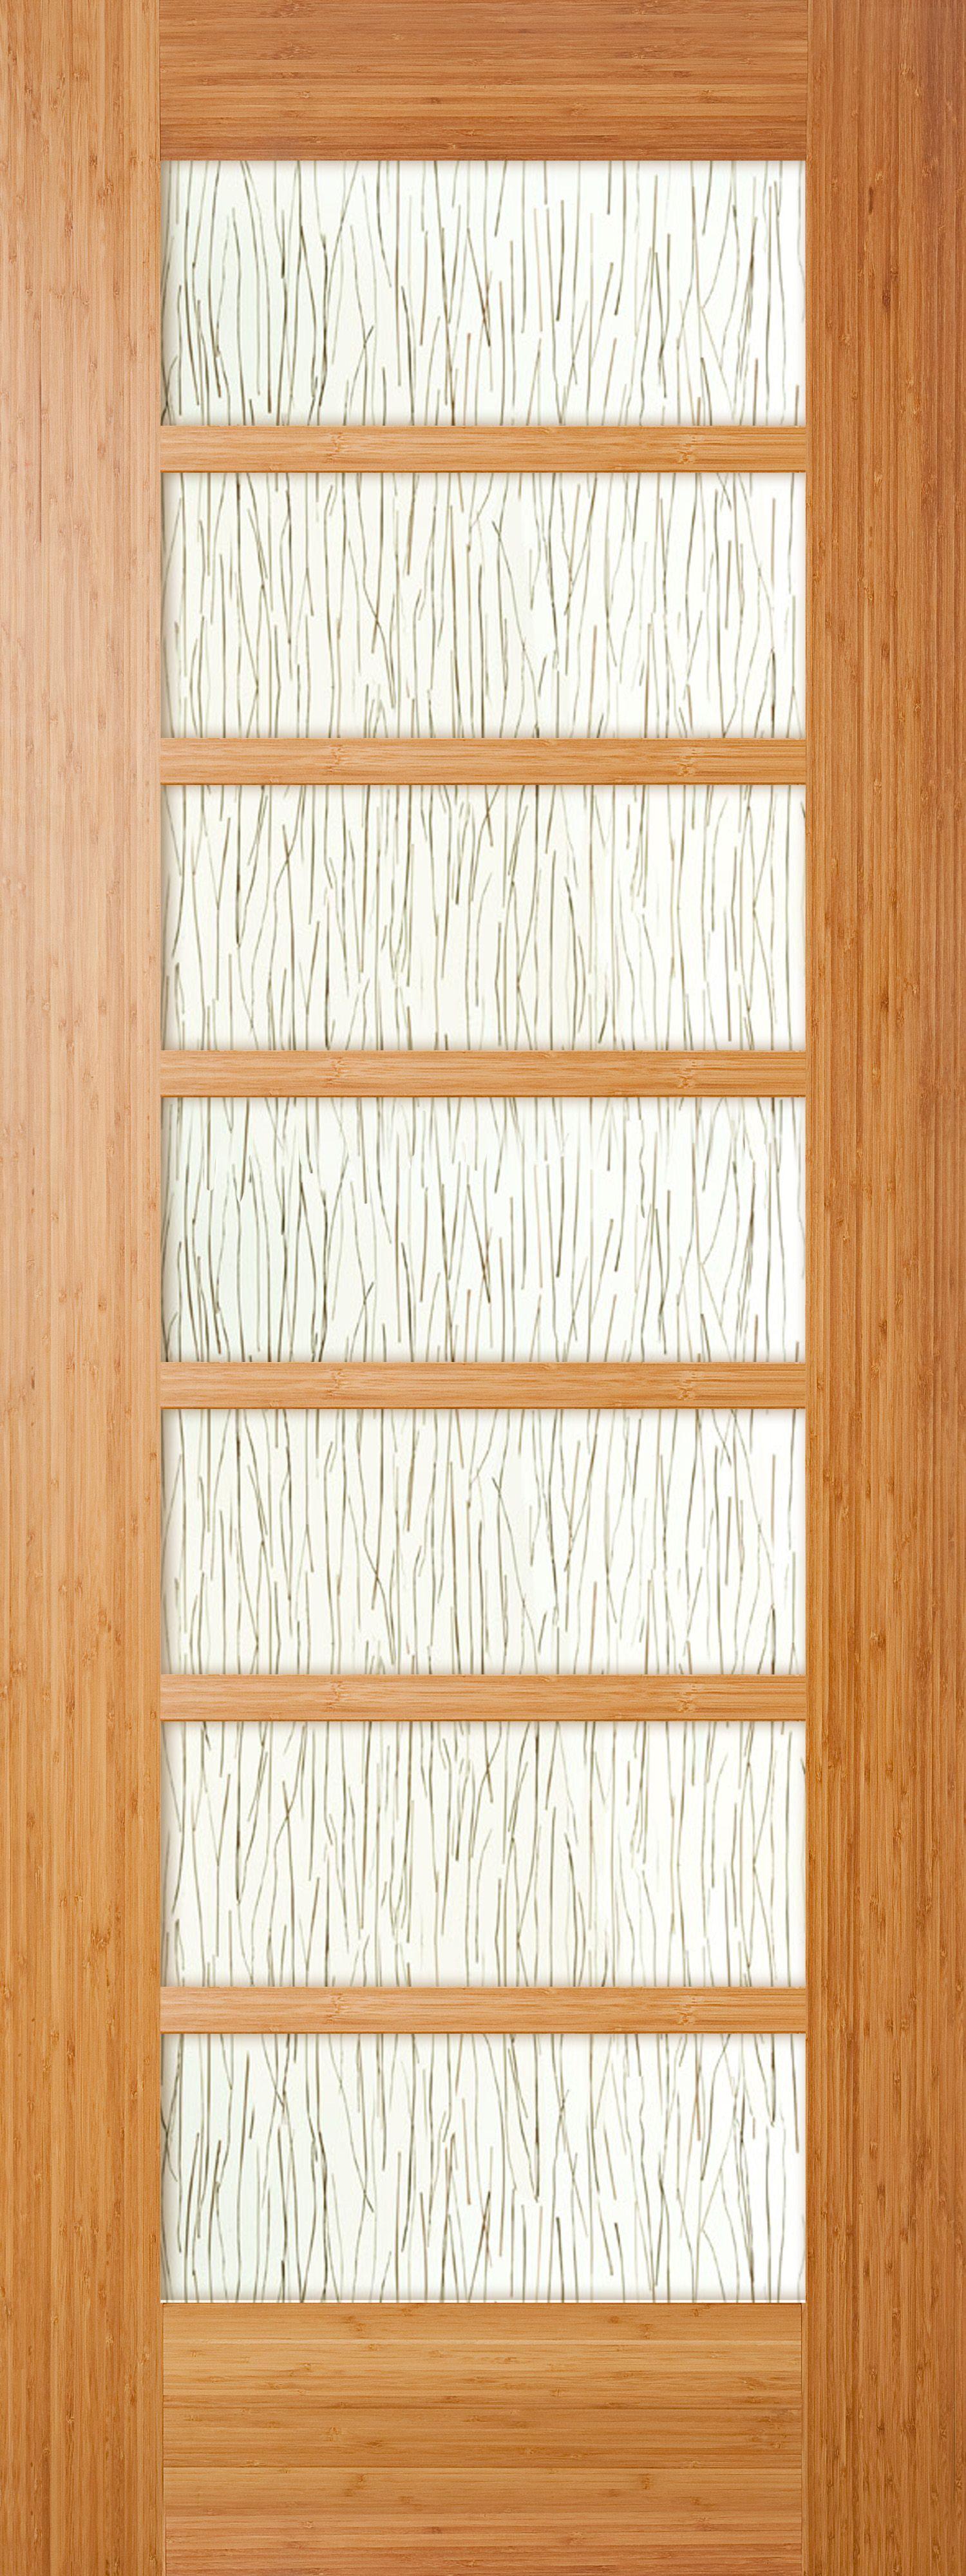 This Stile And Rail Door Has Seven Glass Panels With A Grain Design In The Glass Door Design Glass Panels Beautiful Doors